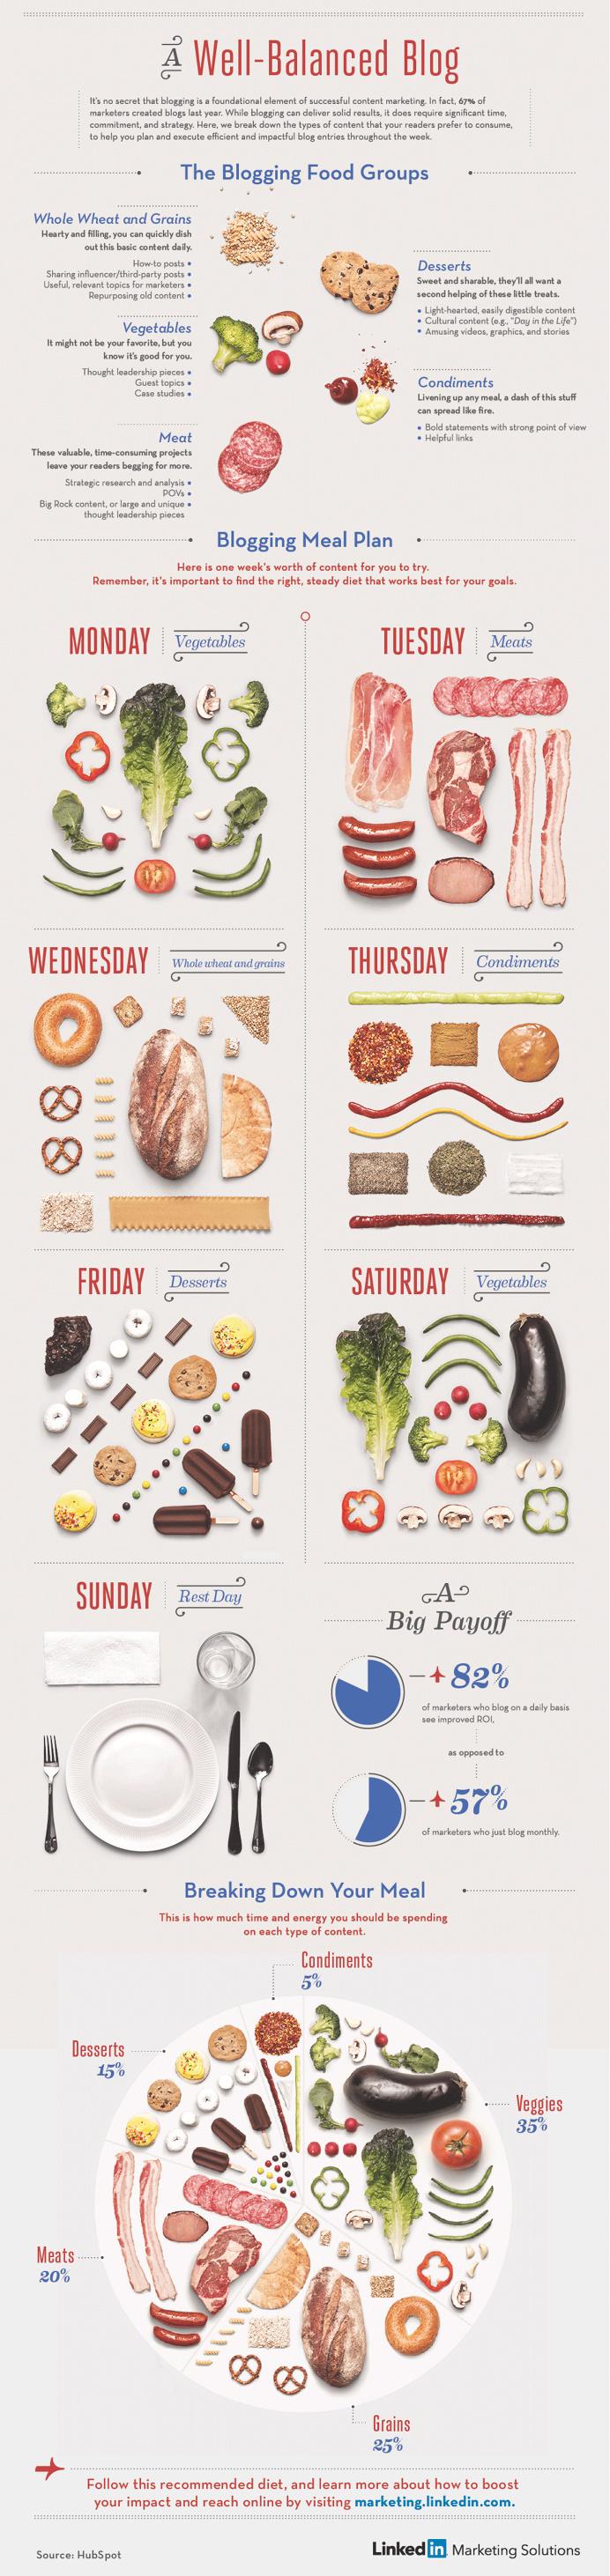 Well Balanced Blog - Infographic